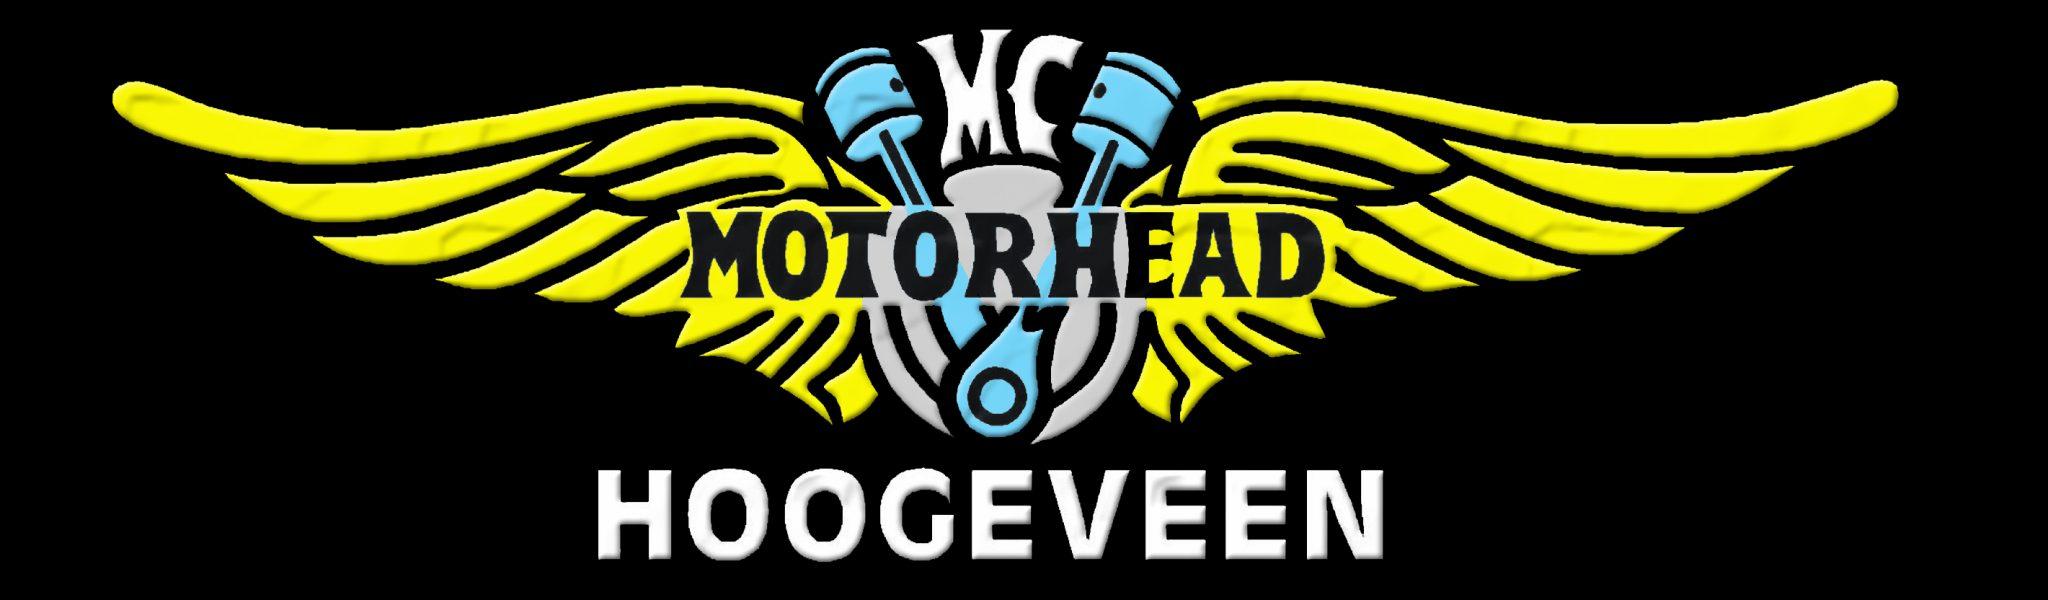 MC Motorhead in de BigTwin